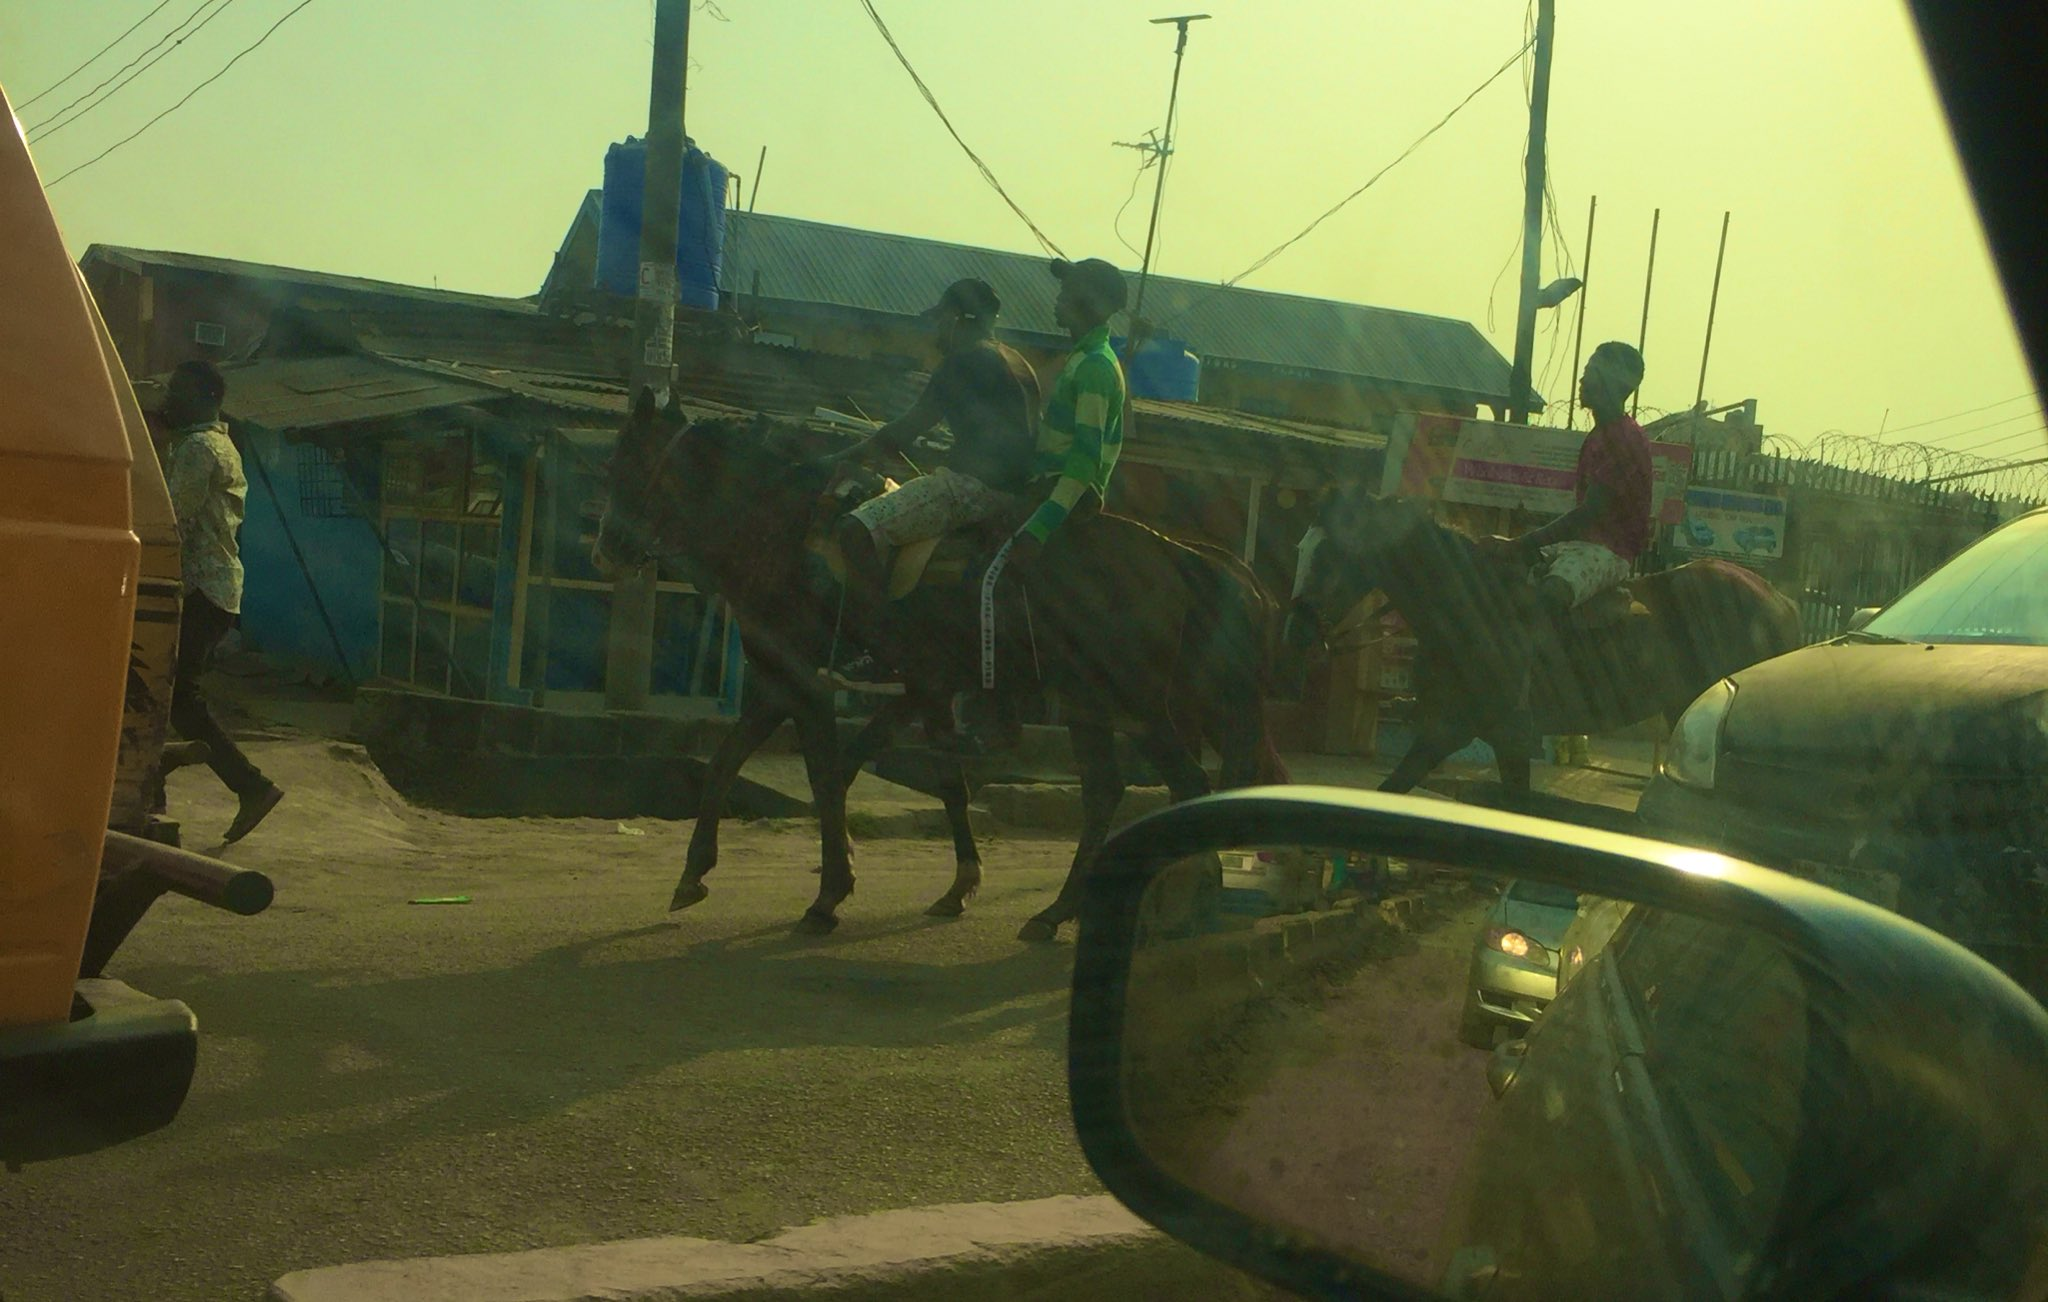 The horses transporting passengers